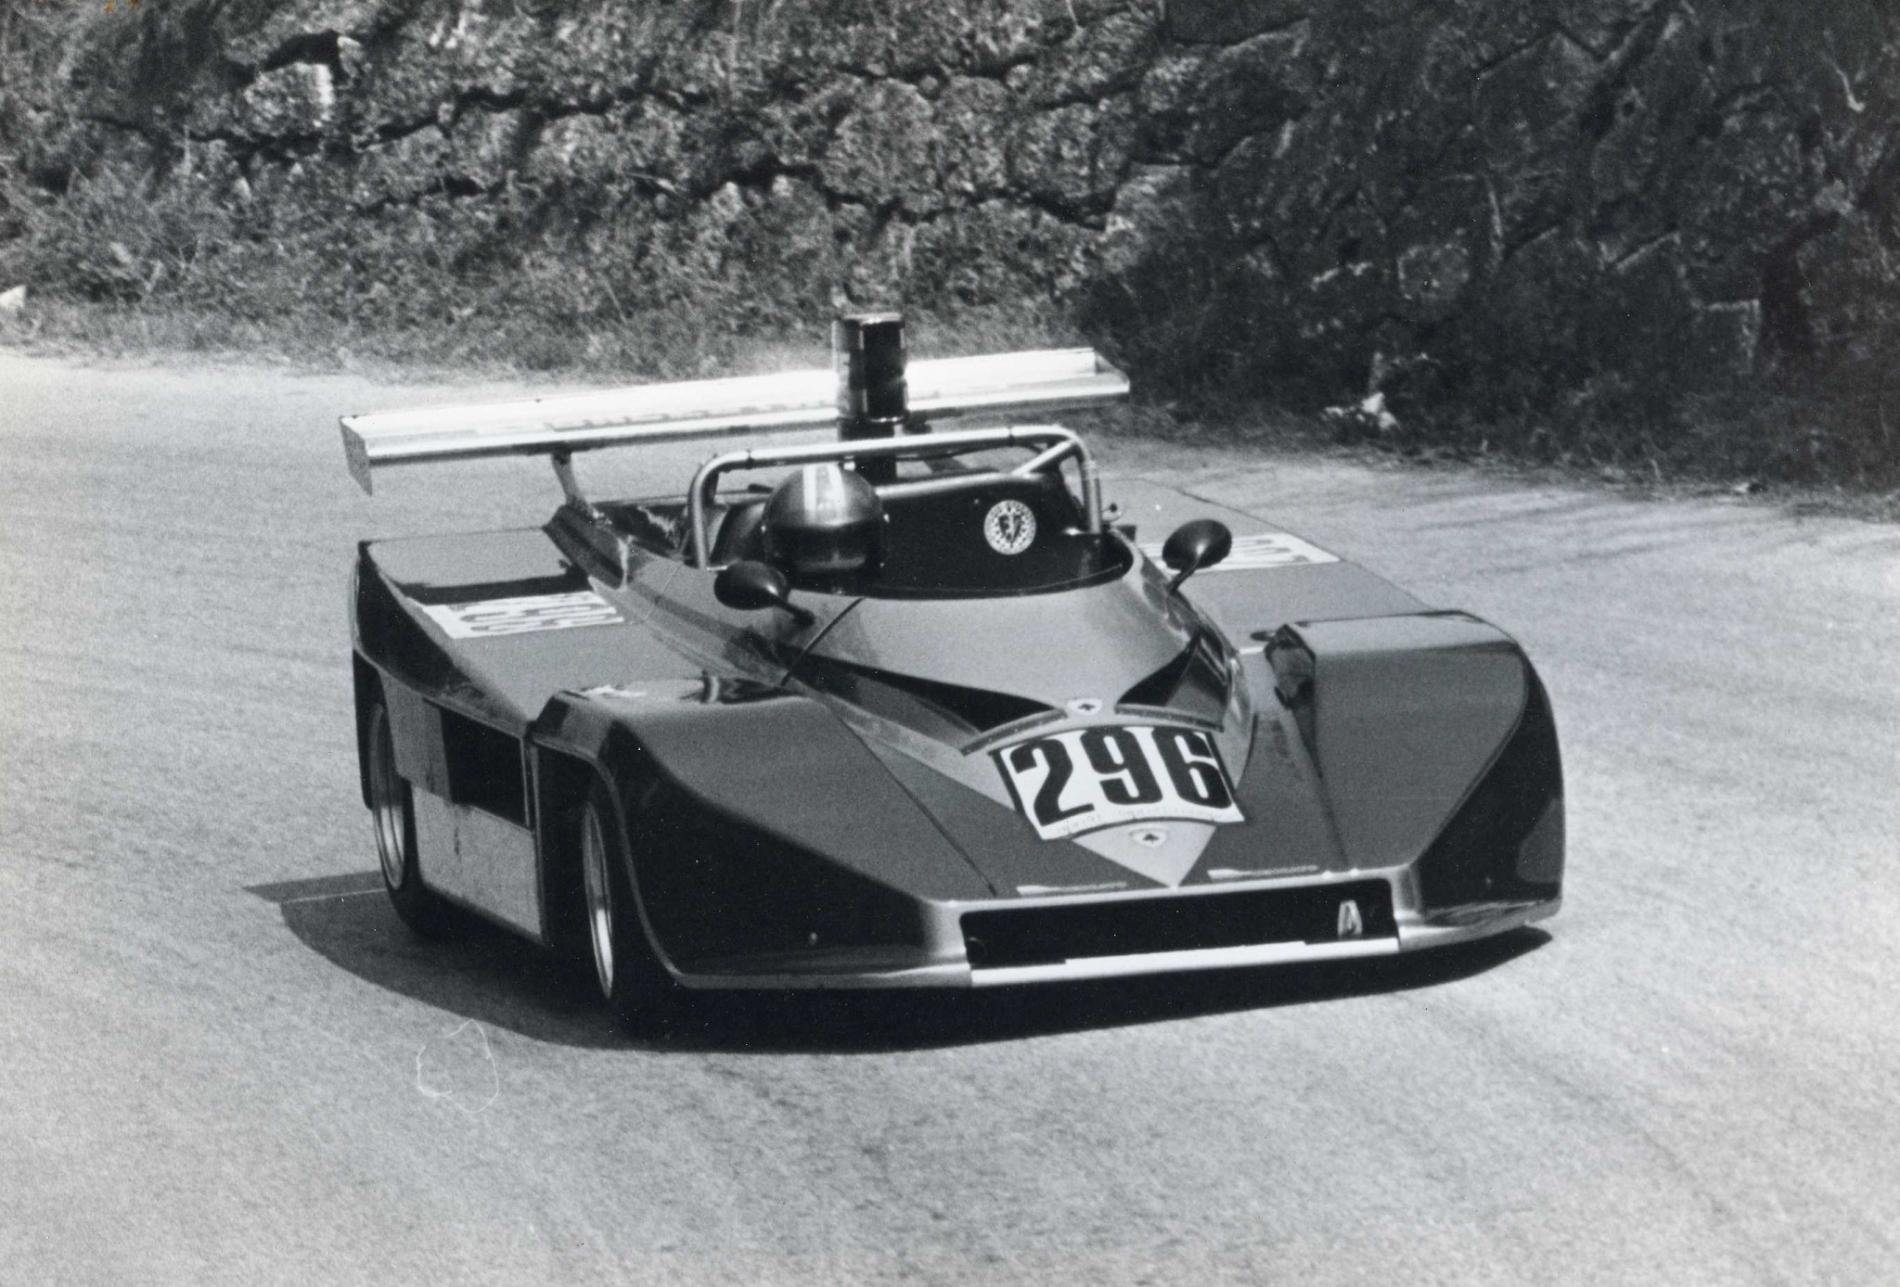 1981 Armando Giammaria AMS 1000 gr.6